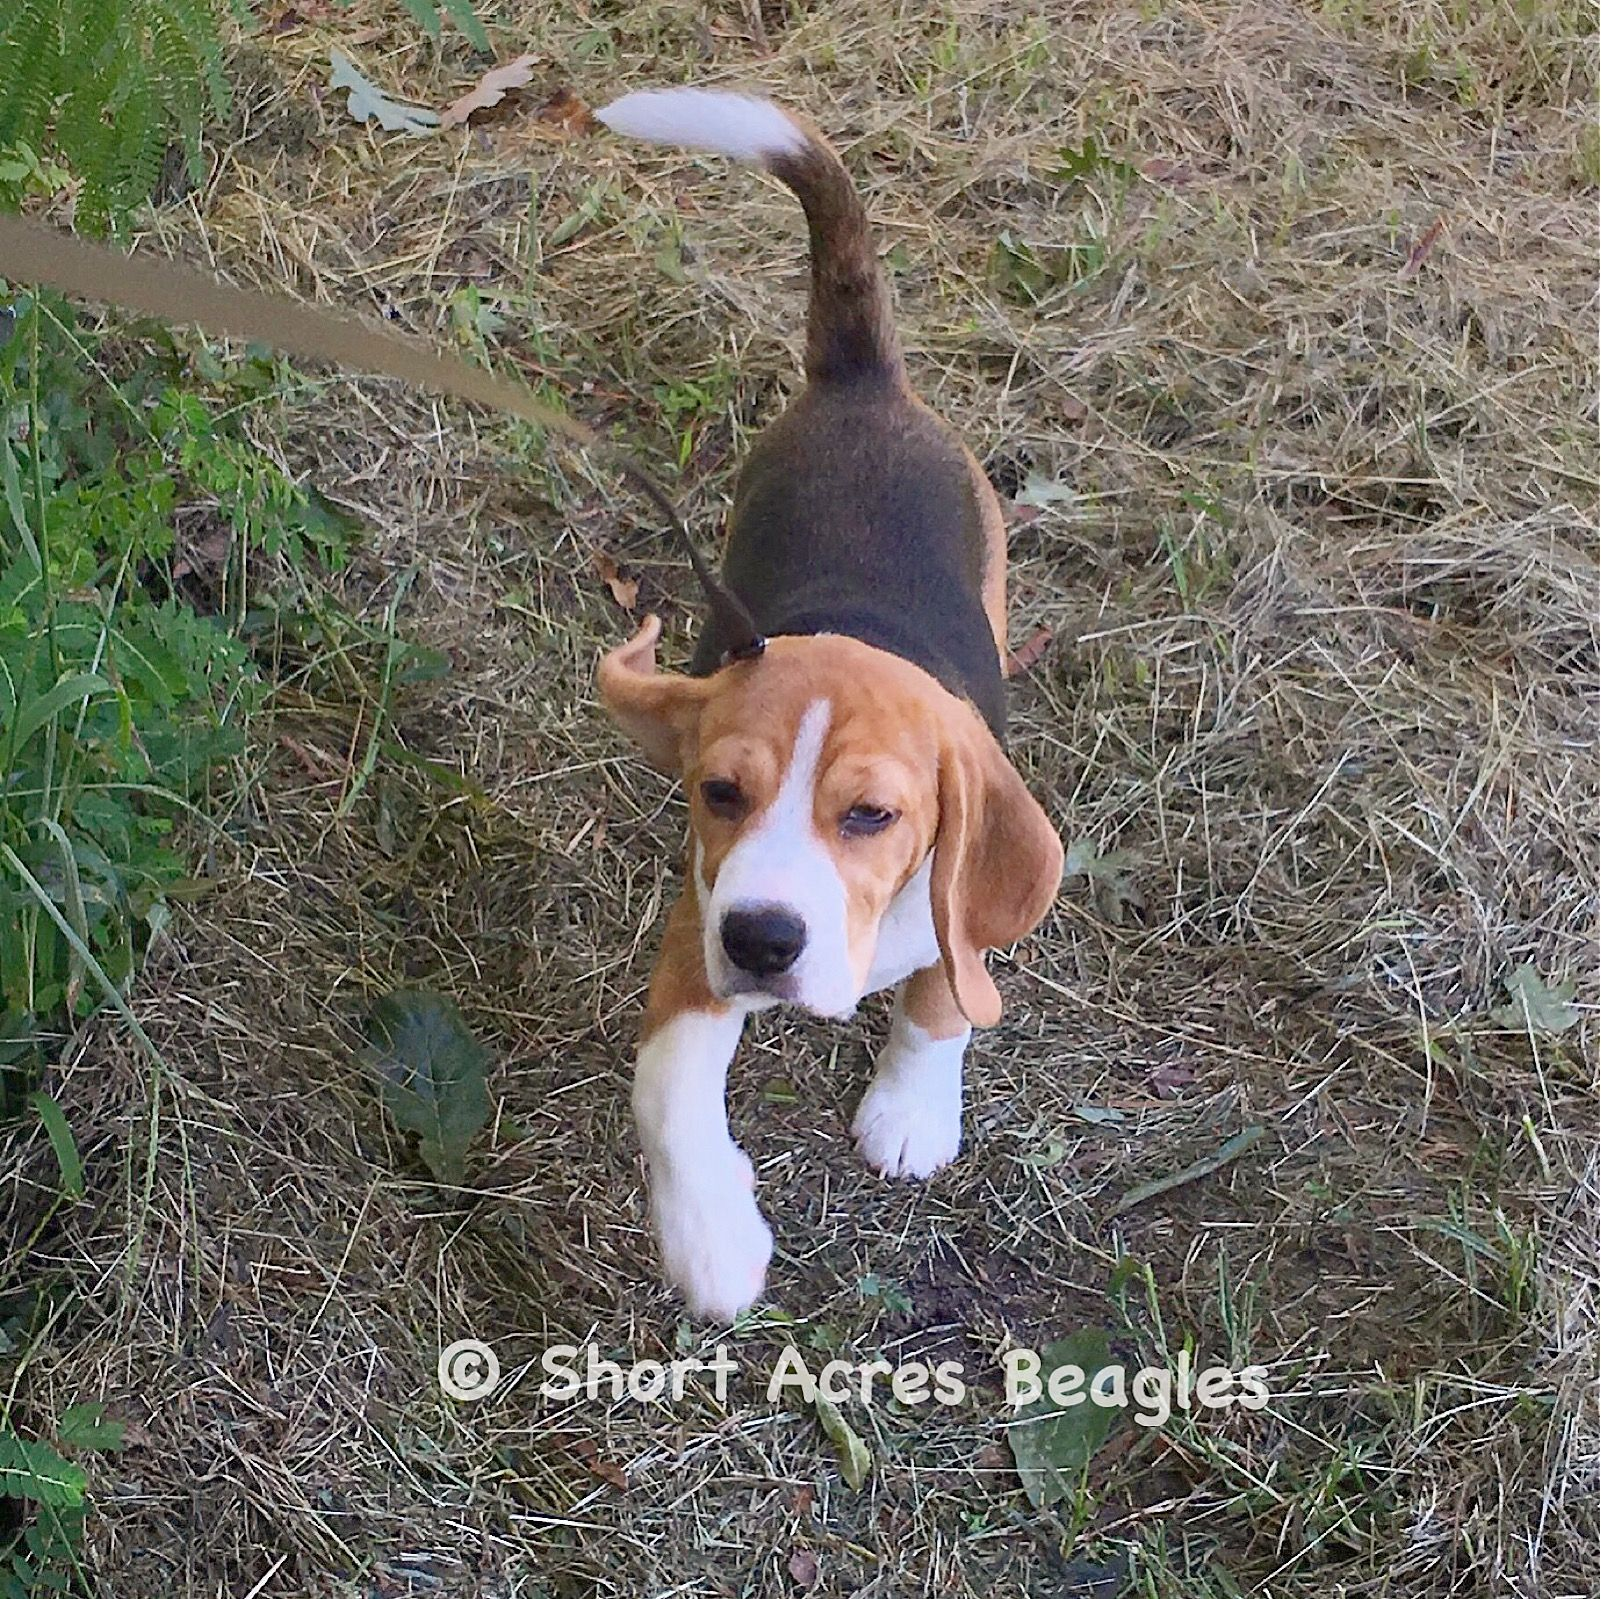 Pin By Beagle Planet On I Love Beagles Beagle Dogs Beagle Puppy